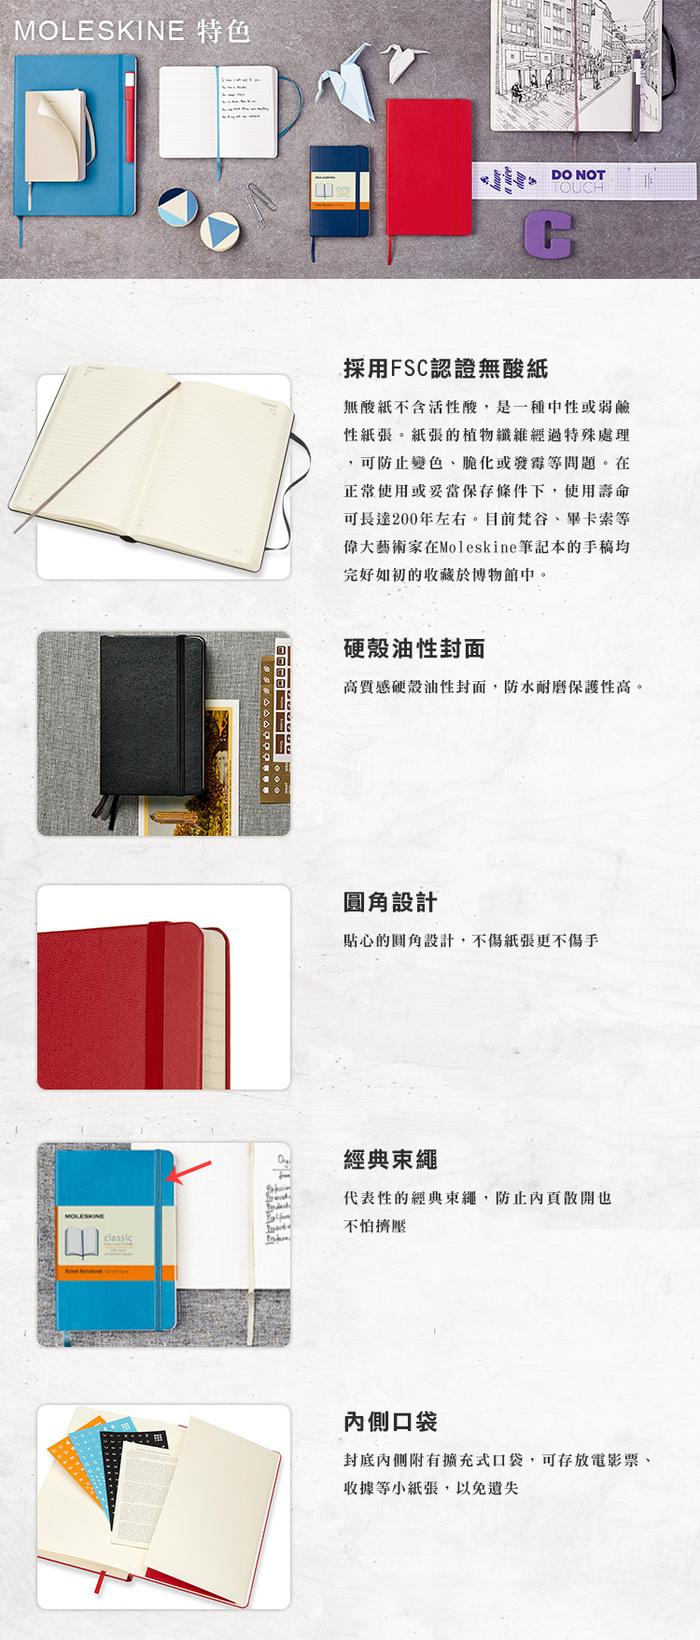 MOLESKINE|經典硬殼筆記本-2018春夏-雛菊粉L型